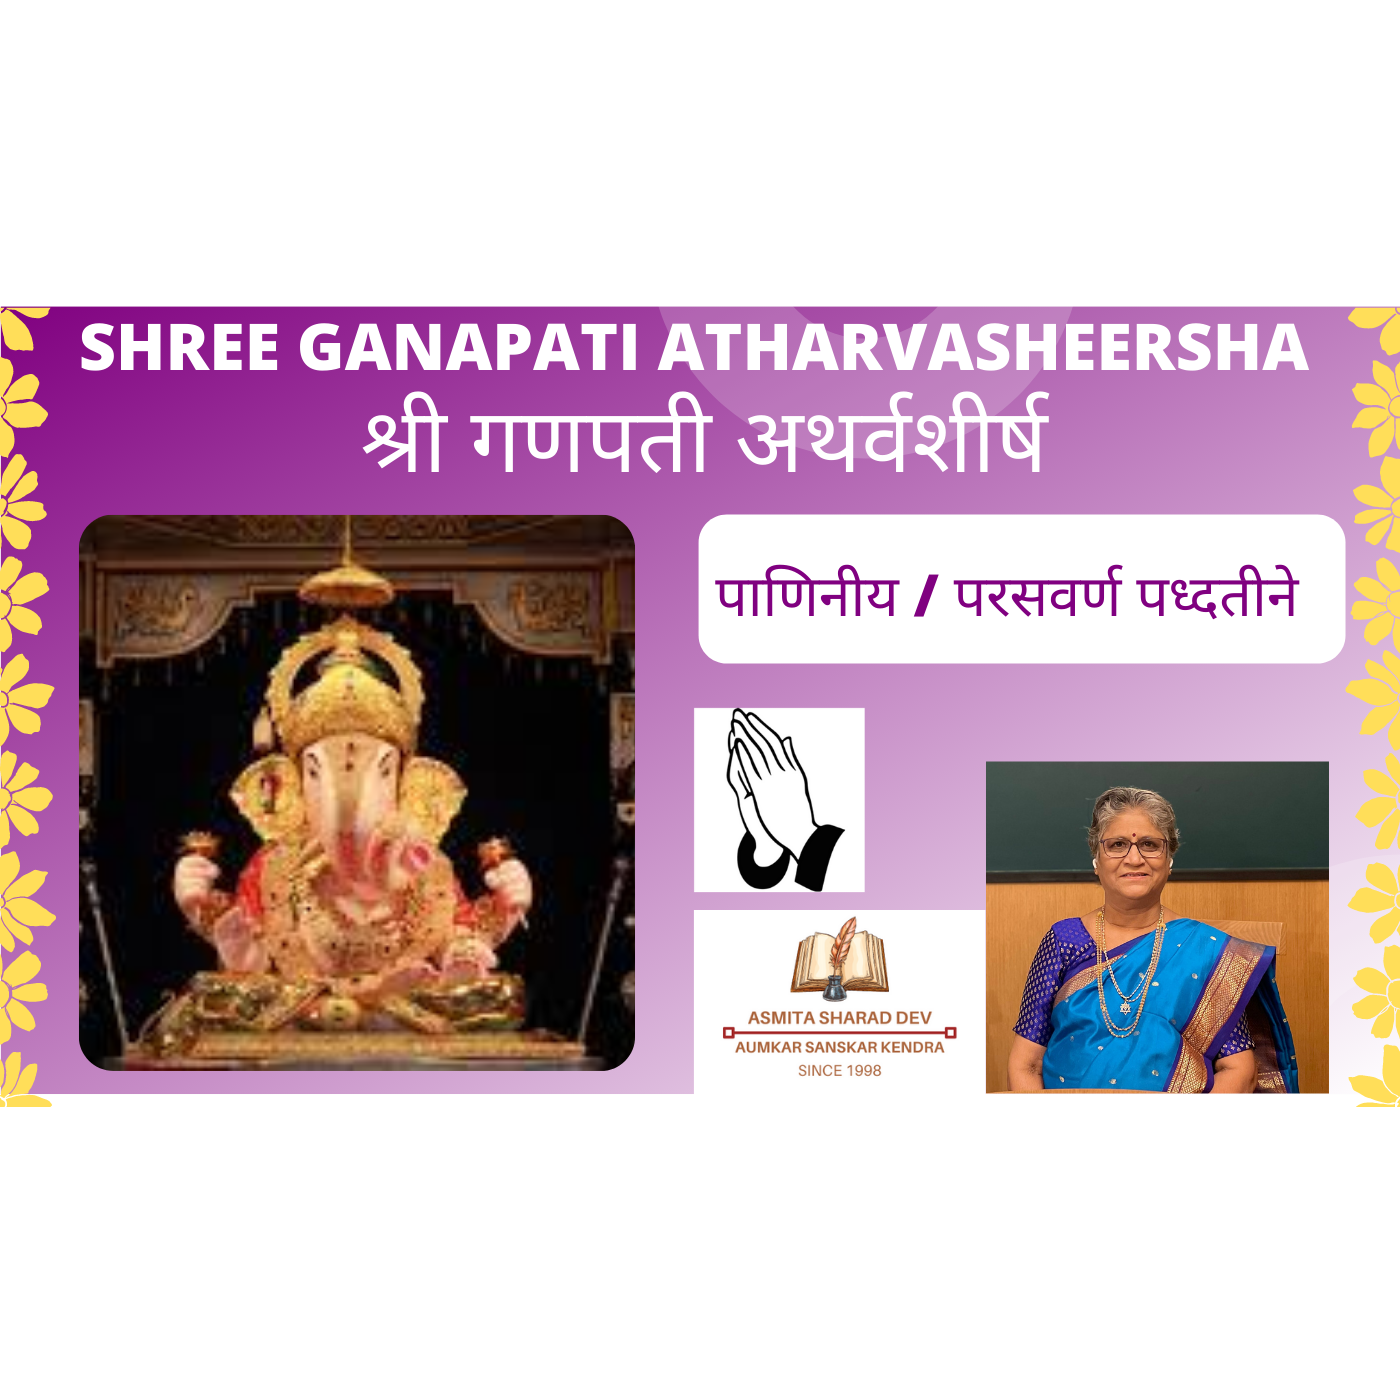 Aumkar Sanskar Kendra - Shree Ganapati Atharvasheersha - पाणिनीय / परसवर्ण पध्दती - गणपती अथर्वशीर्ष